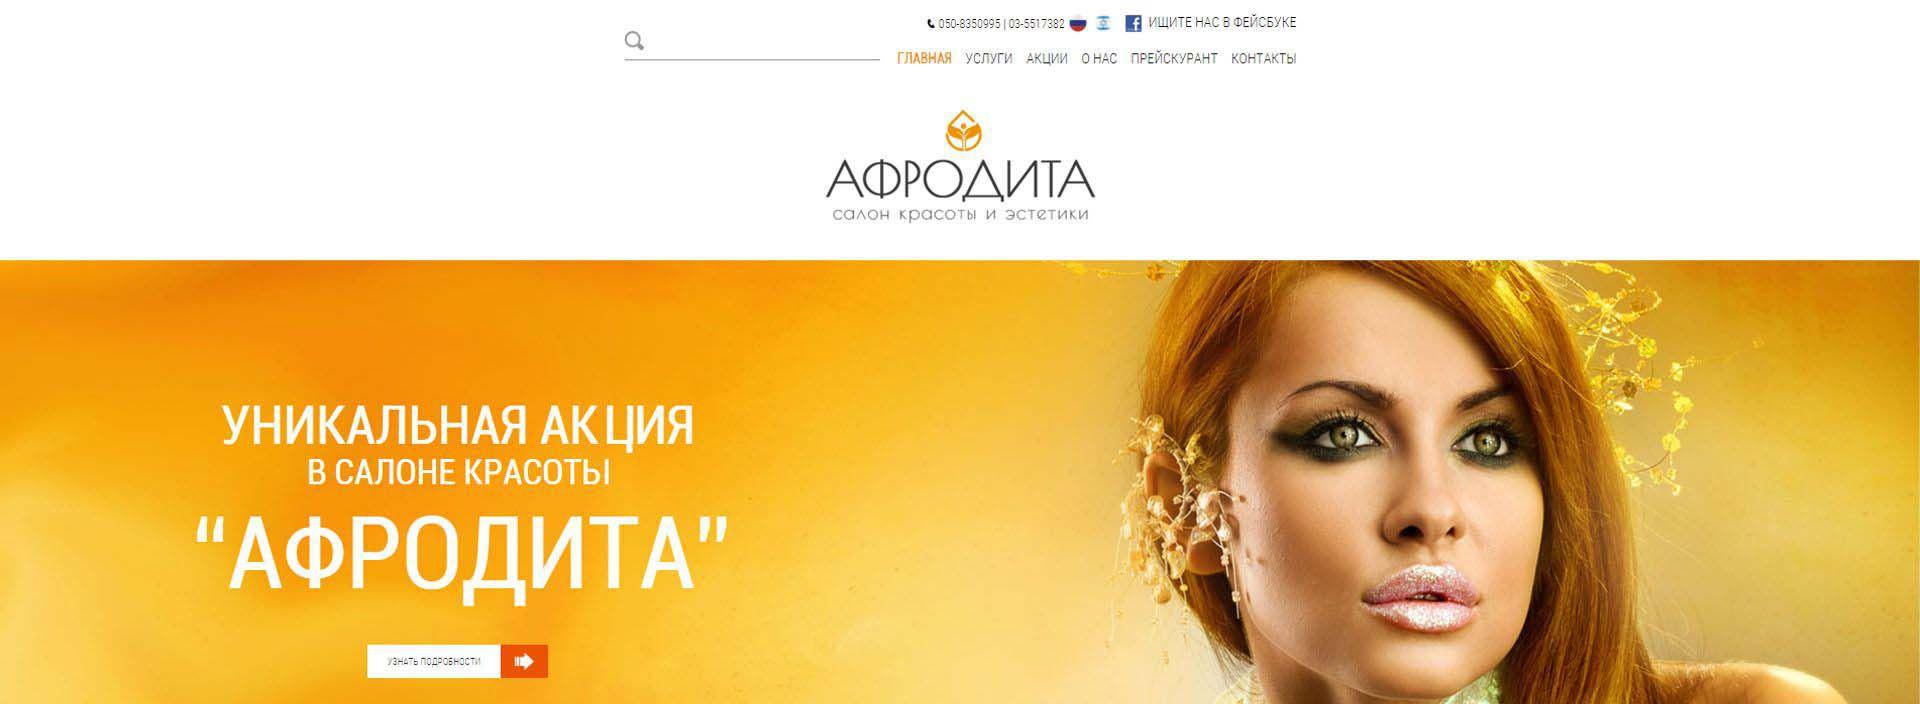 Салон красоты и эстетики Афродита